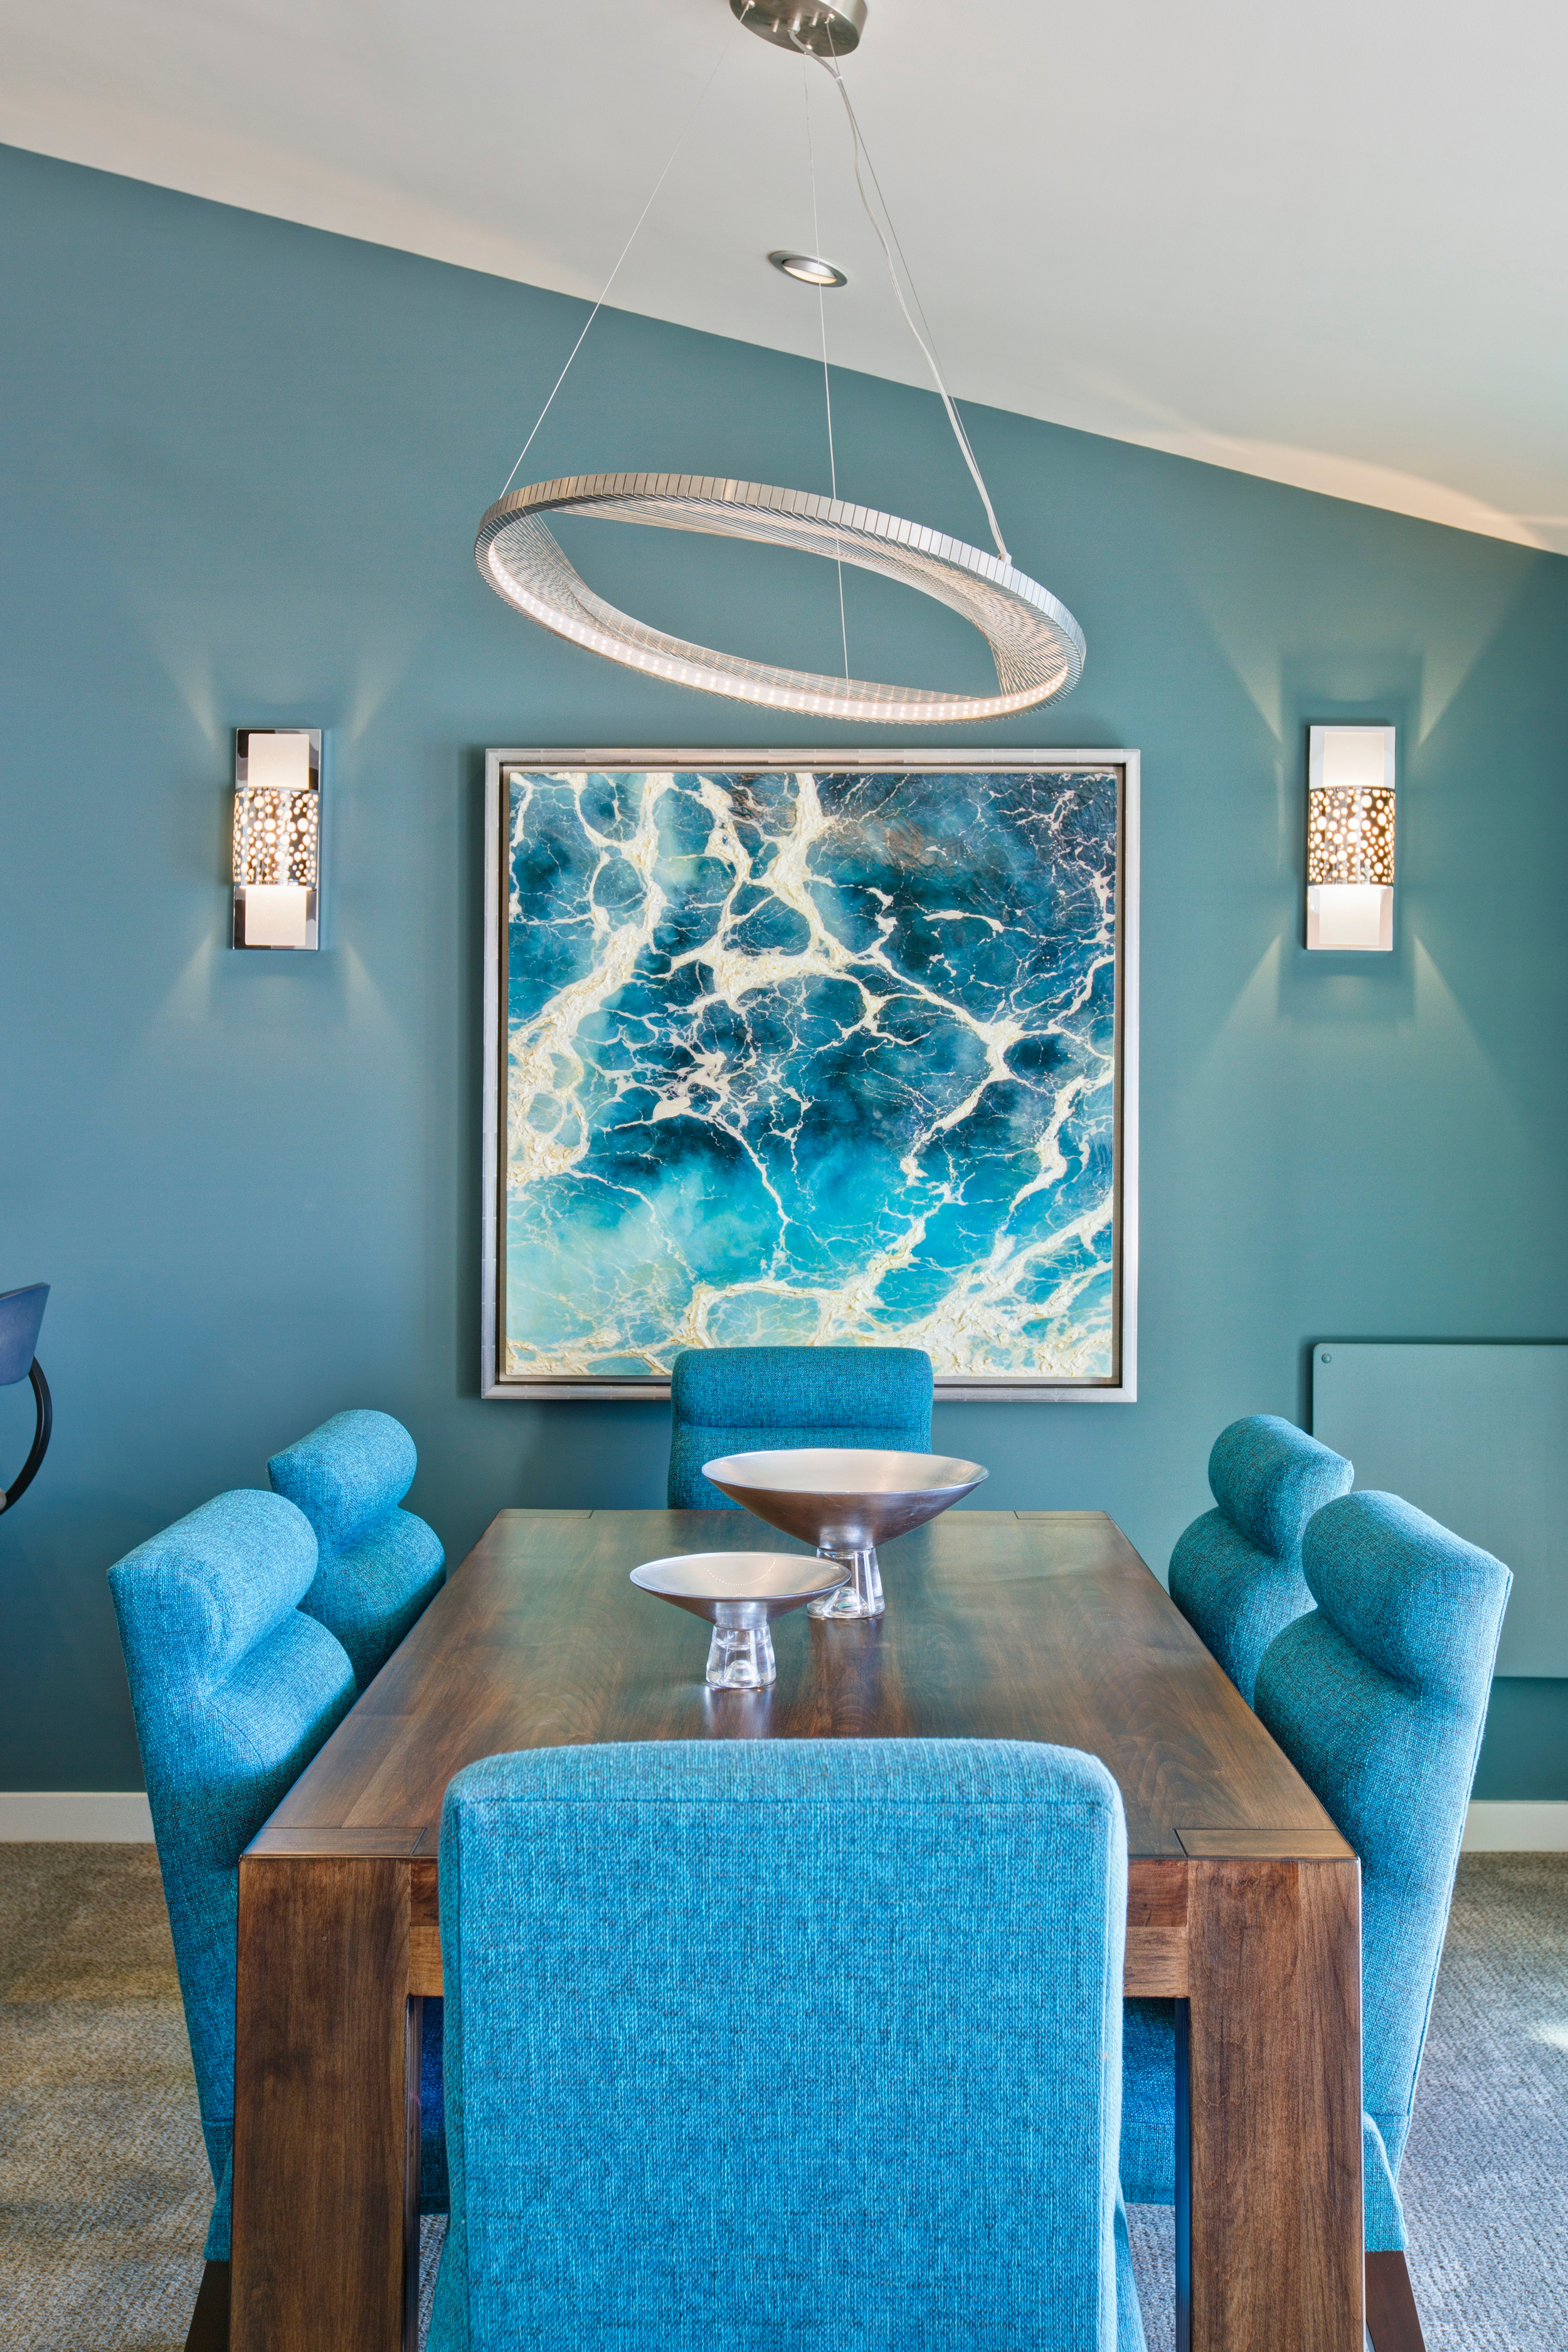 SOLANA BEACH DINING ROOM SIGNATURE DESIGNS BONNIE BAGLEY CATLIN.jpg